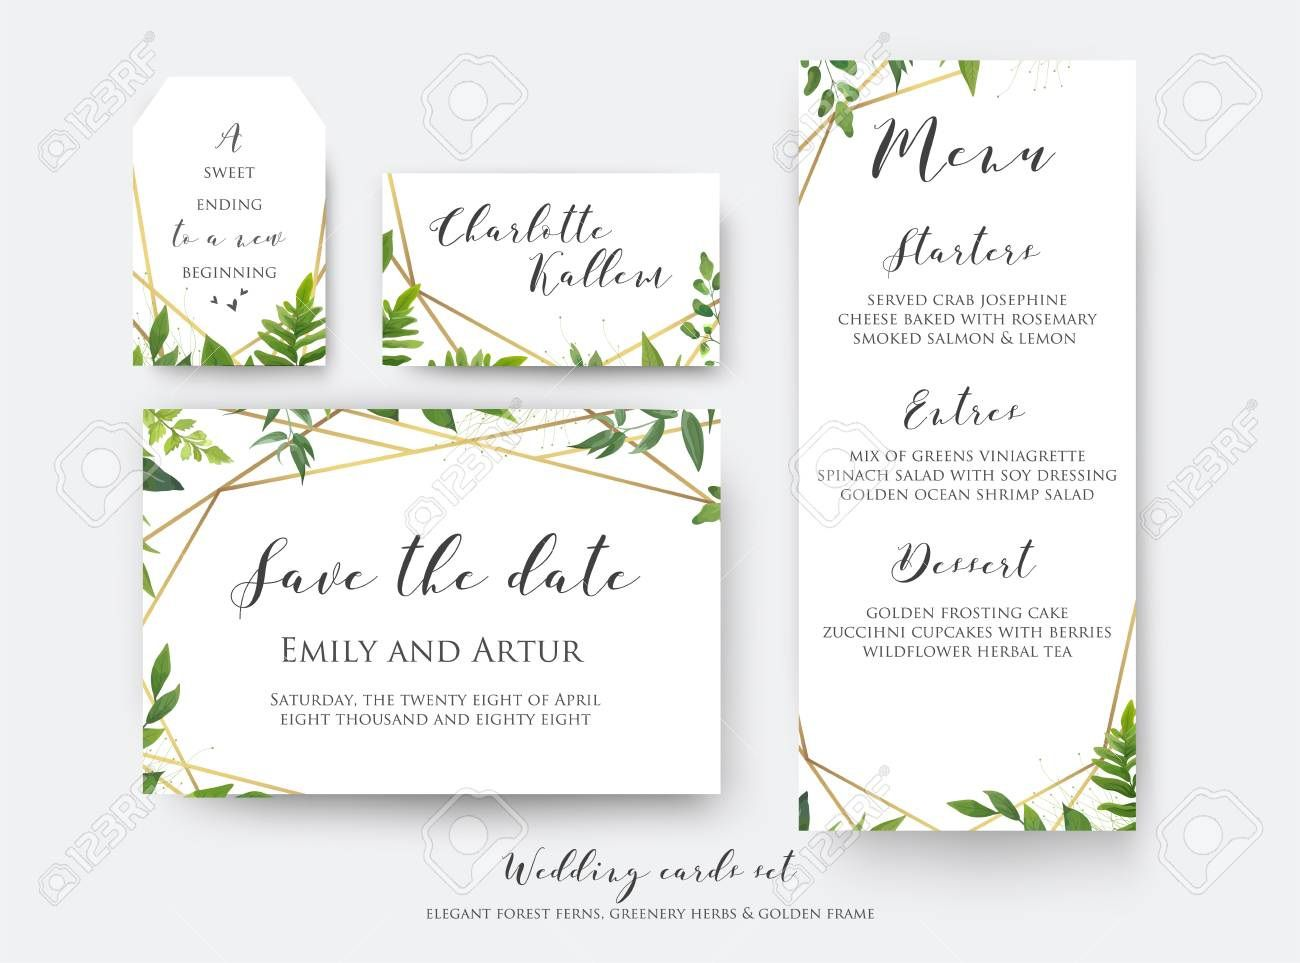 001 Unusual Wedding Addres Label Template Photo  Free PrintableFull